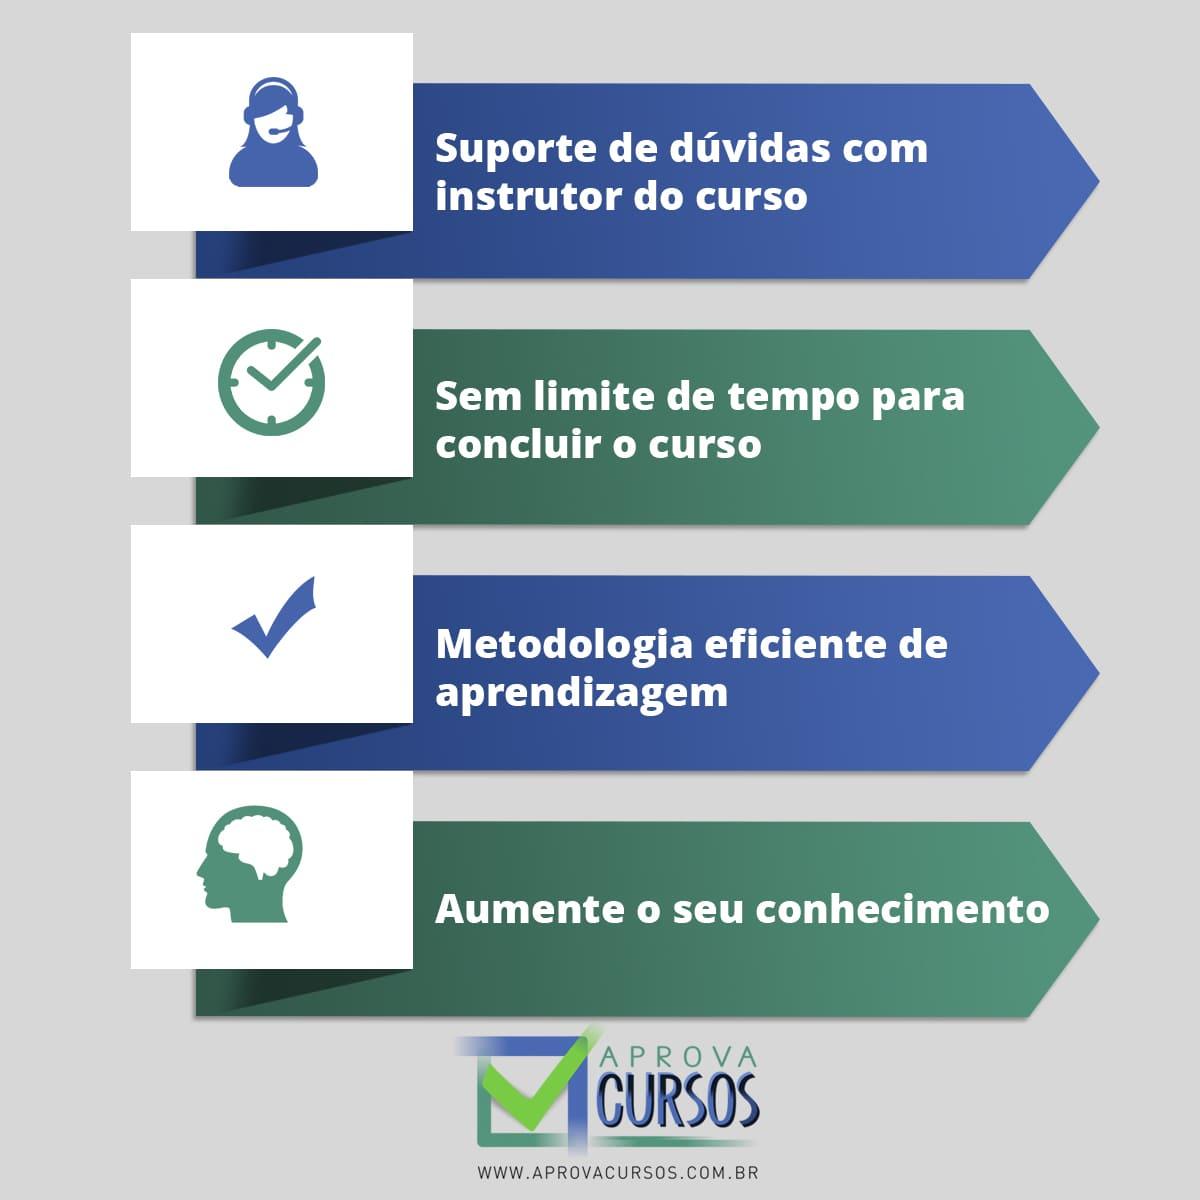 Curso Online de Cuidador Infantil com Certificado  - Aprova Cursos